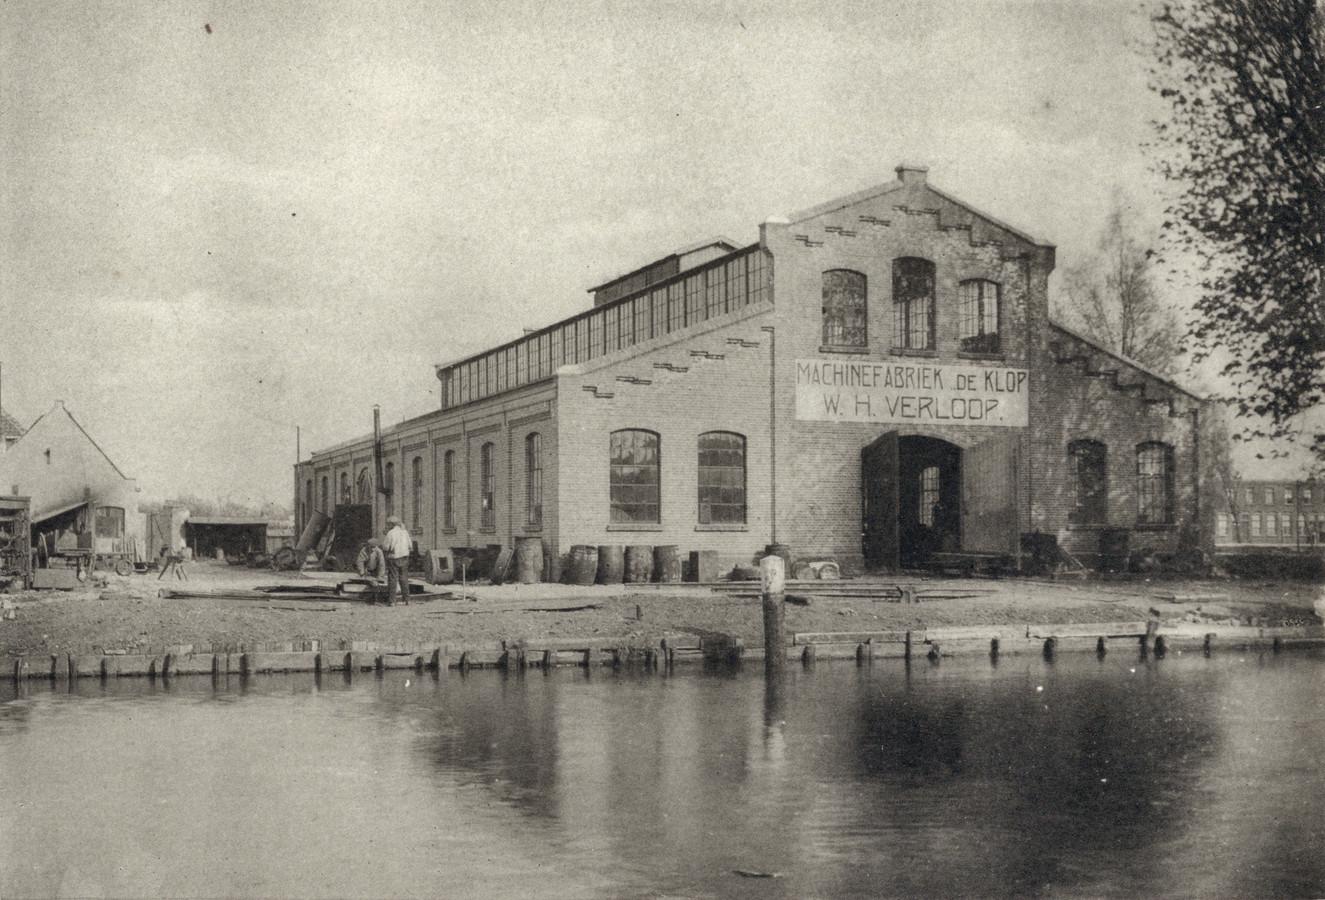 De oude machinefabriek De Klop.